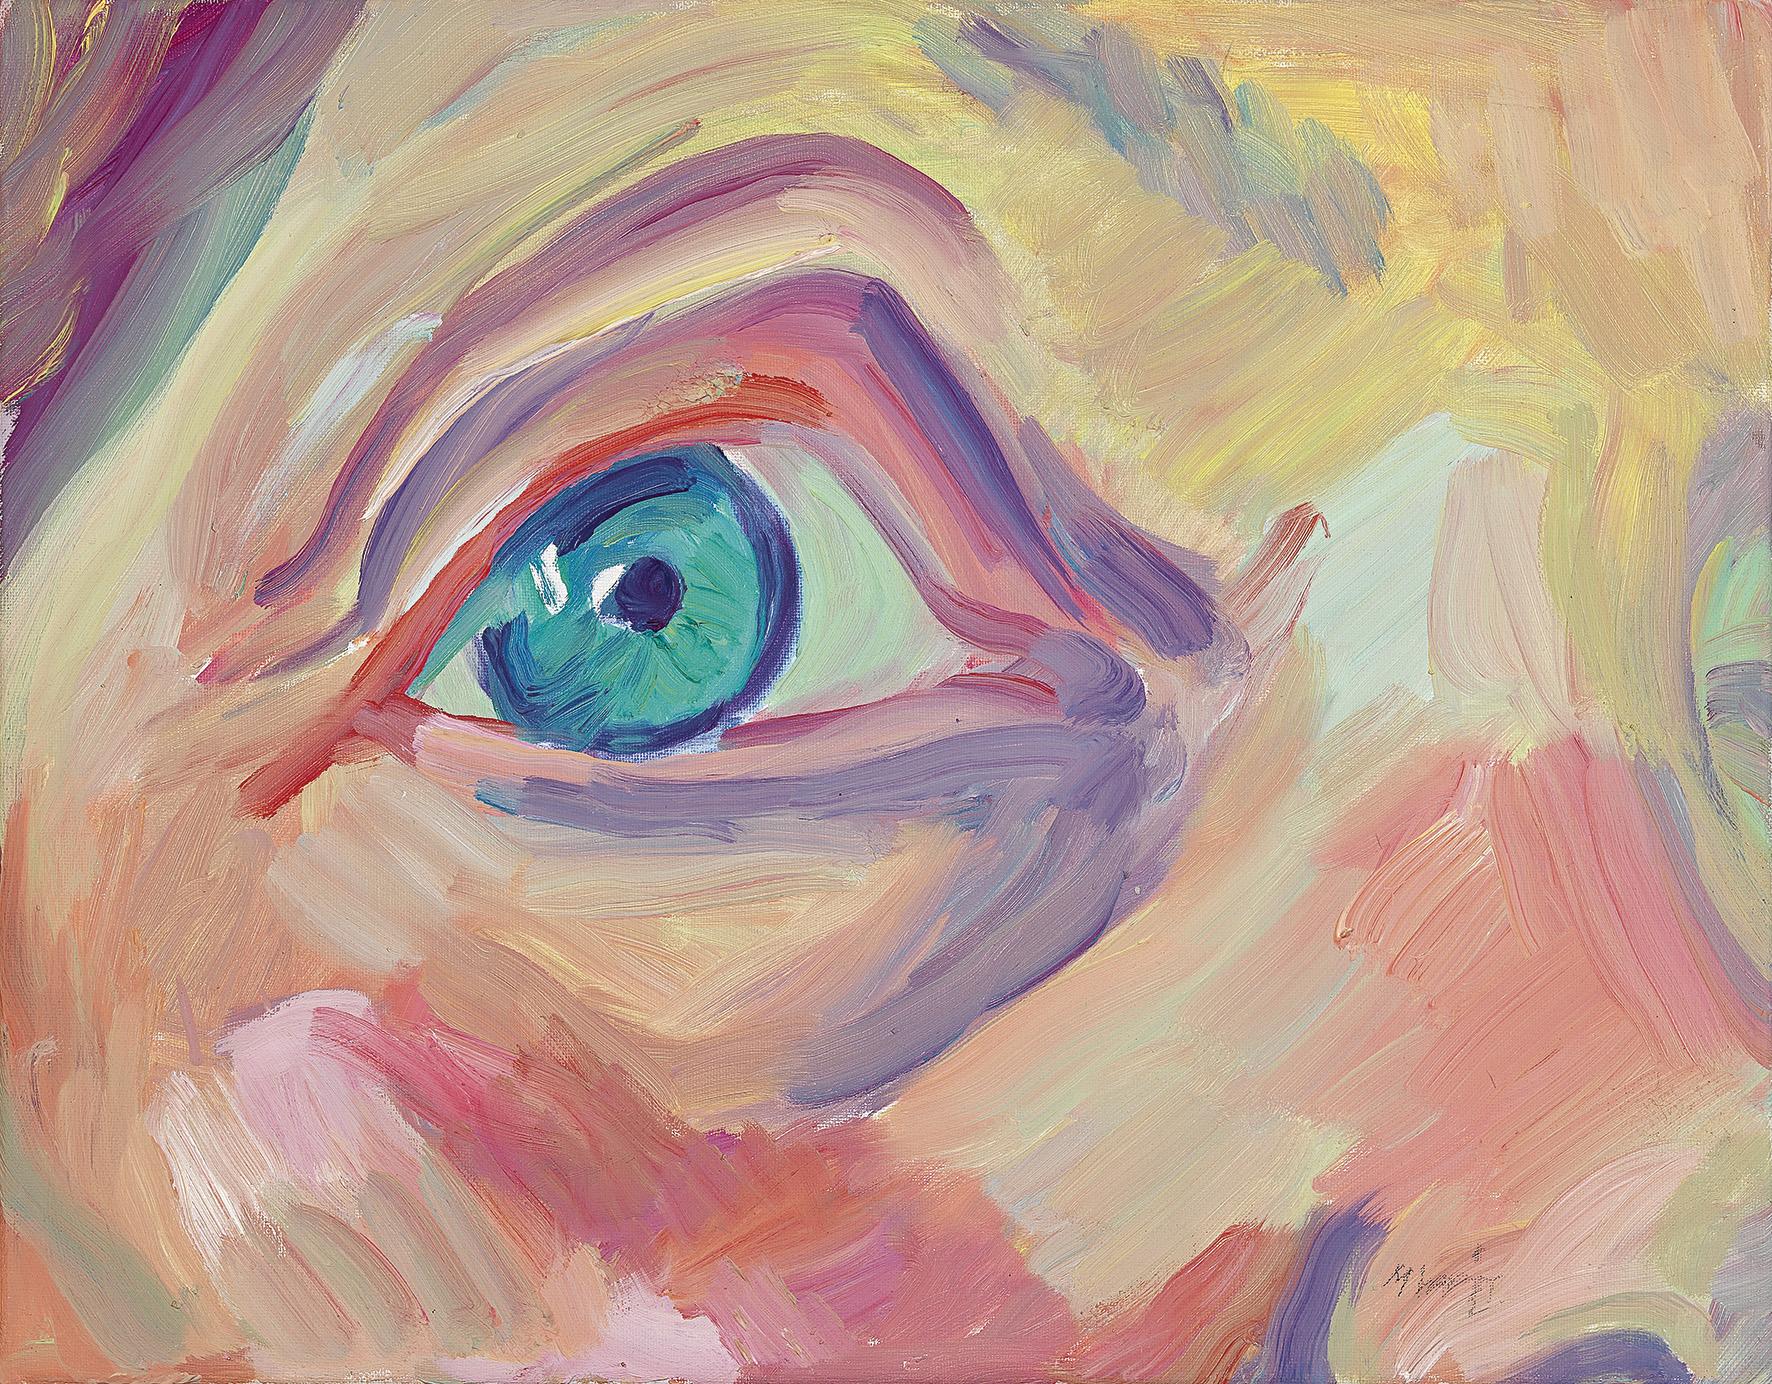 Da Egon Schiele a Keith Haring e Maria Lassnig. In arrivo la Contemporary Week diDorotheum